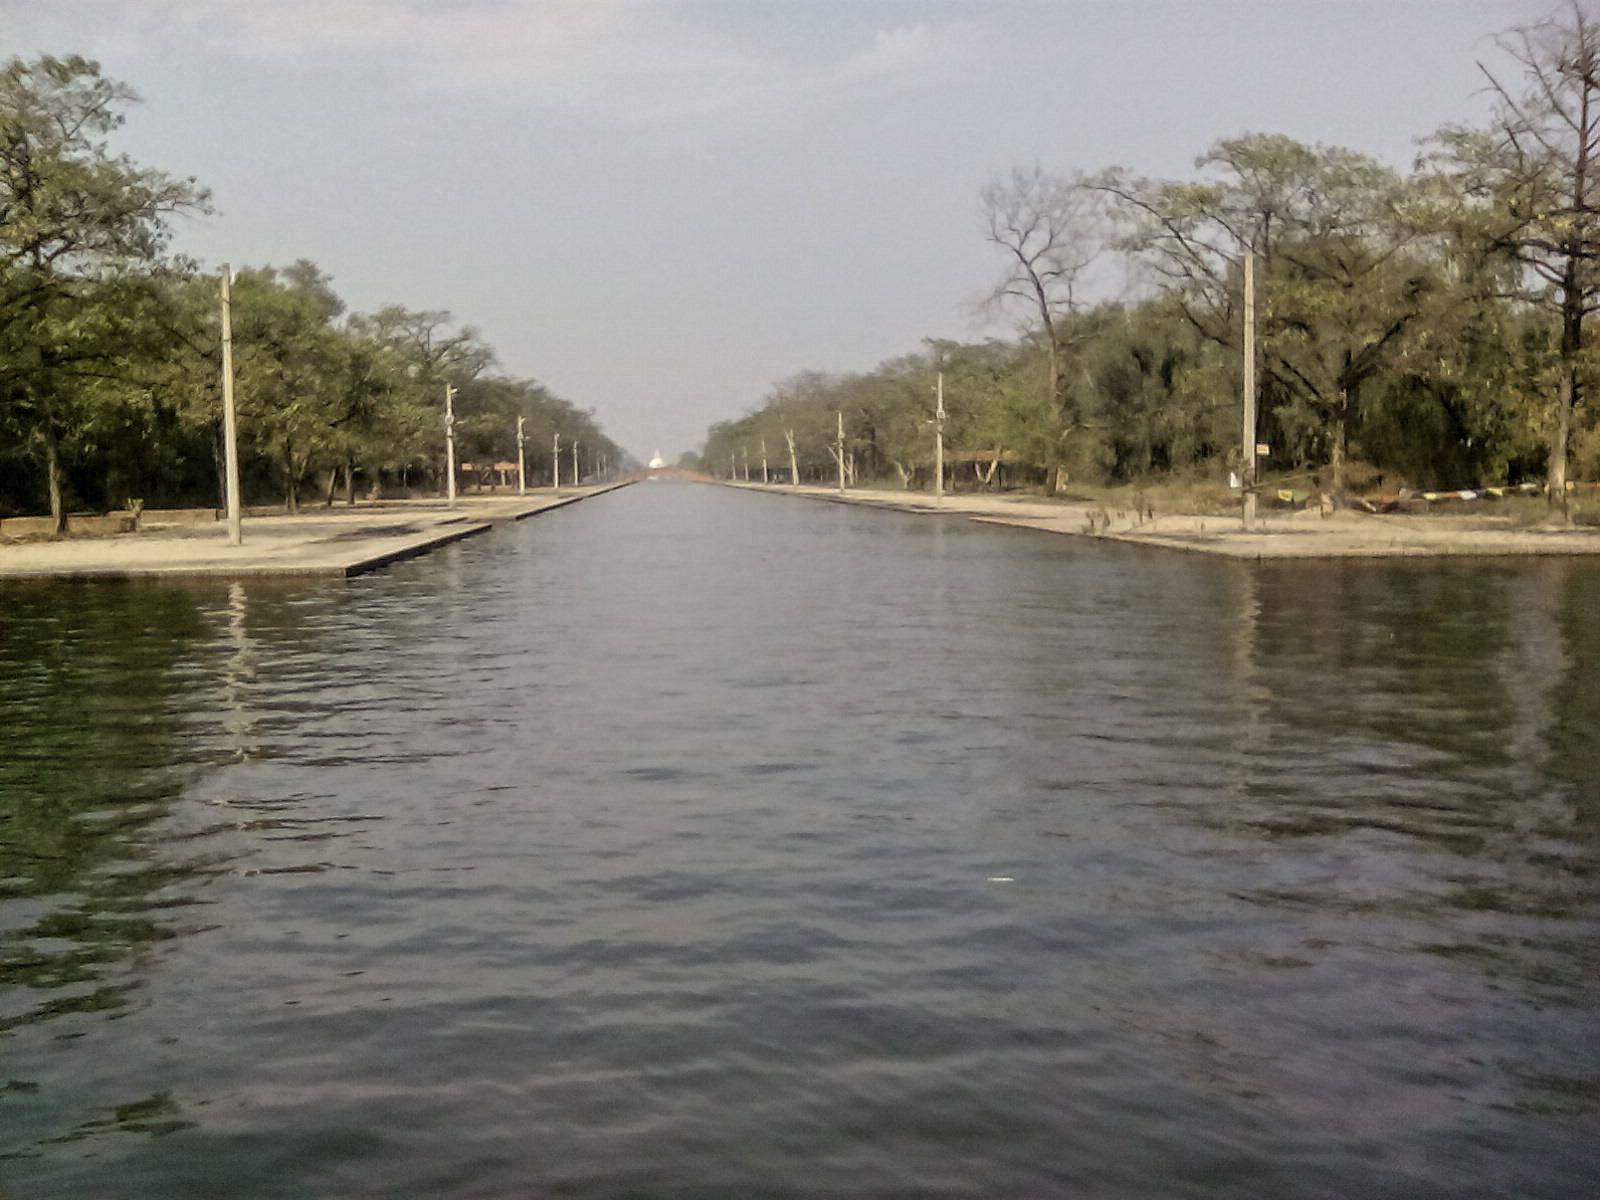 parc monastique visiter lumbini nepal calme nature canal